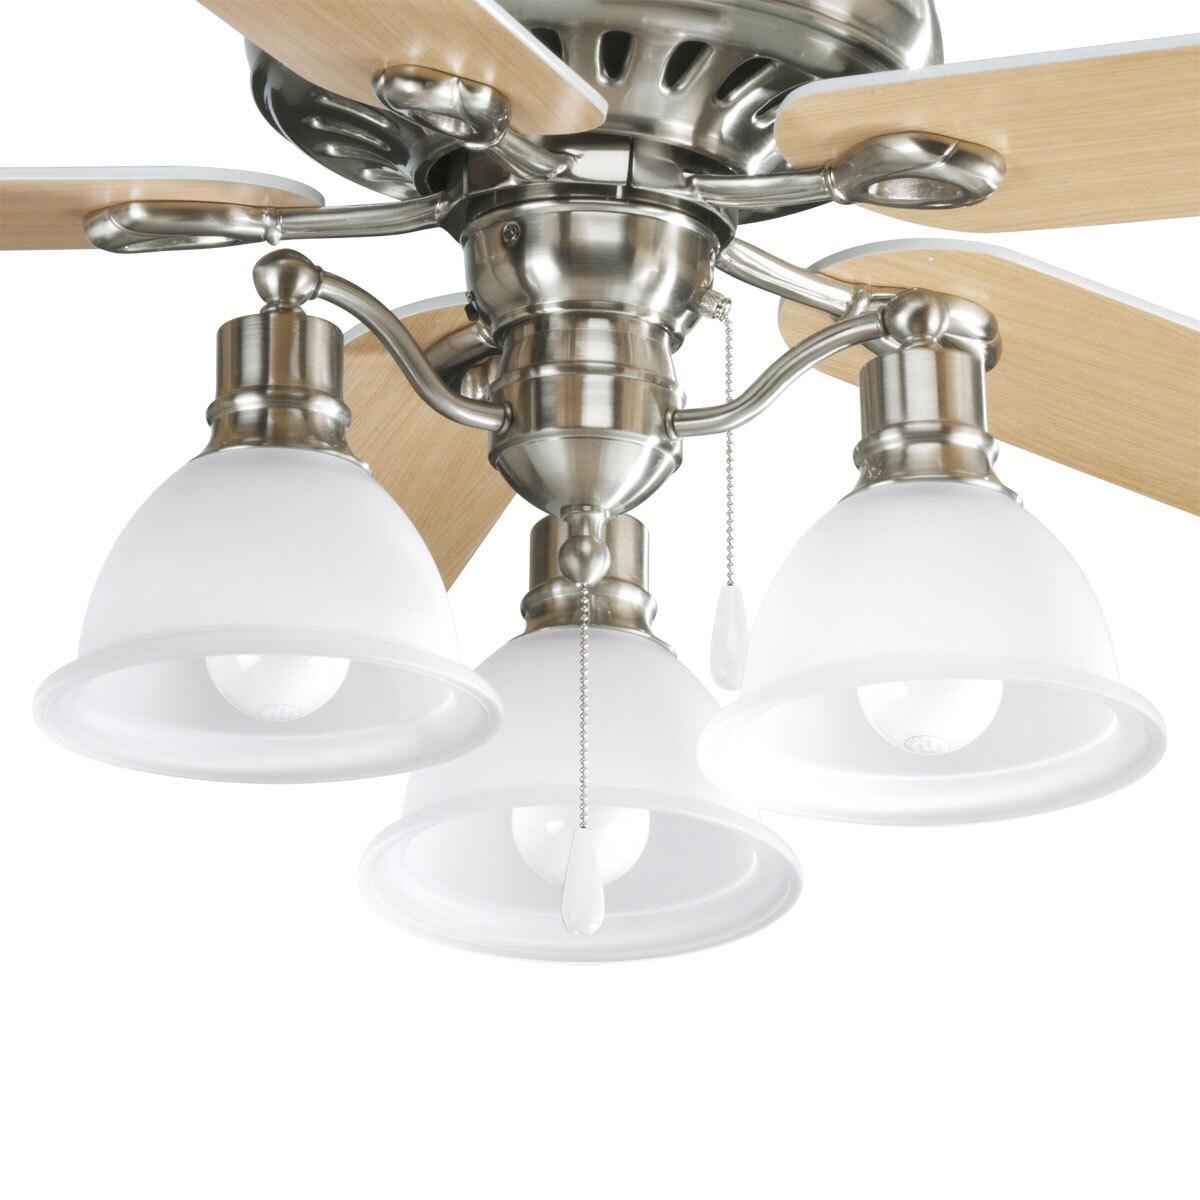 ceiling zoom brushed halogen kichler contemporary realta light mini pendant kic loading nickel ceilings